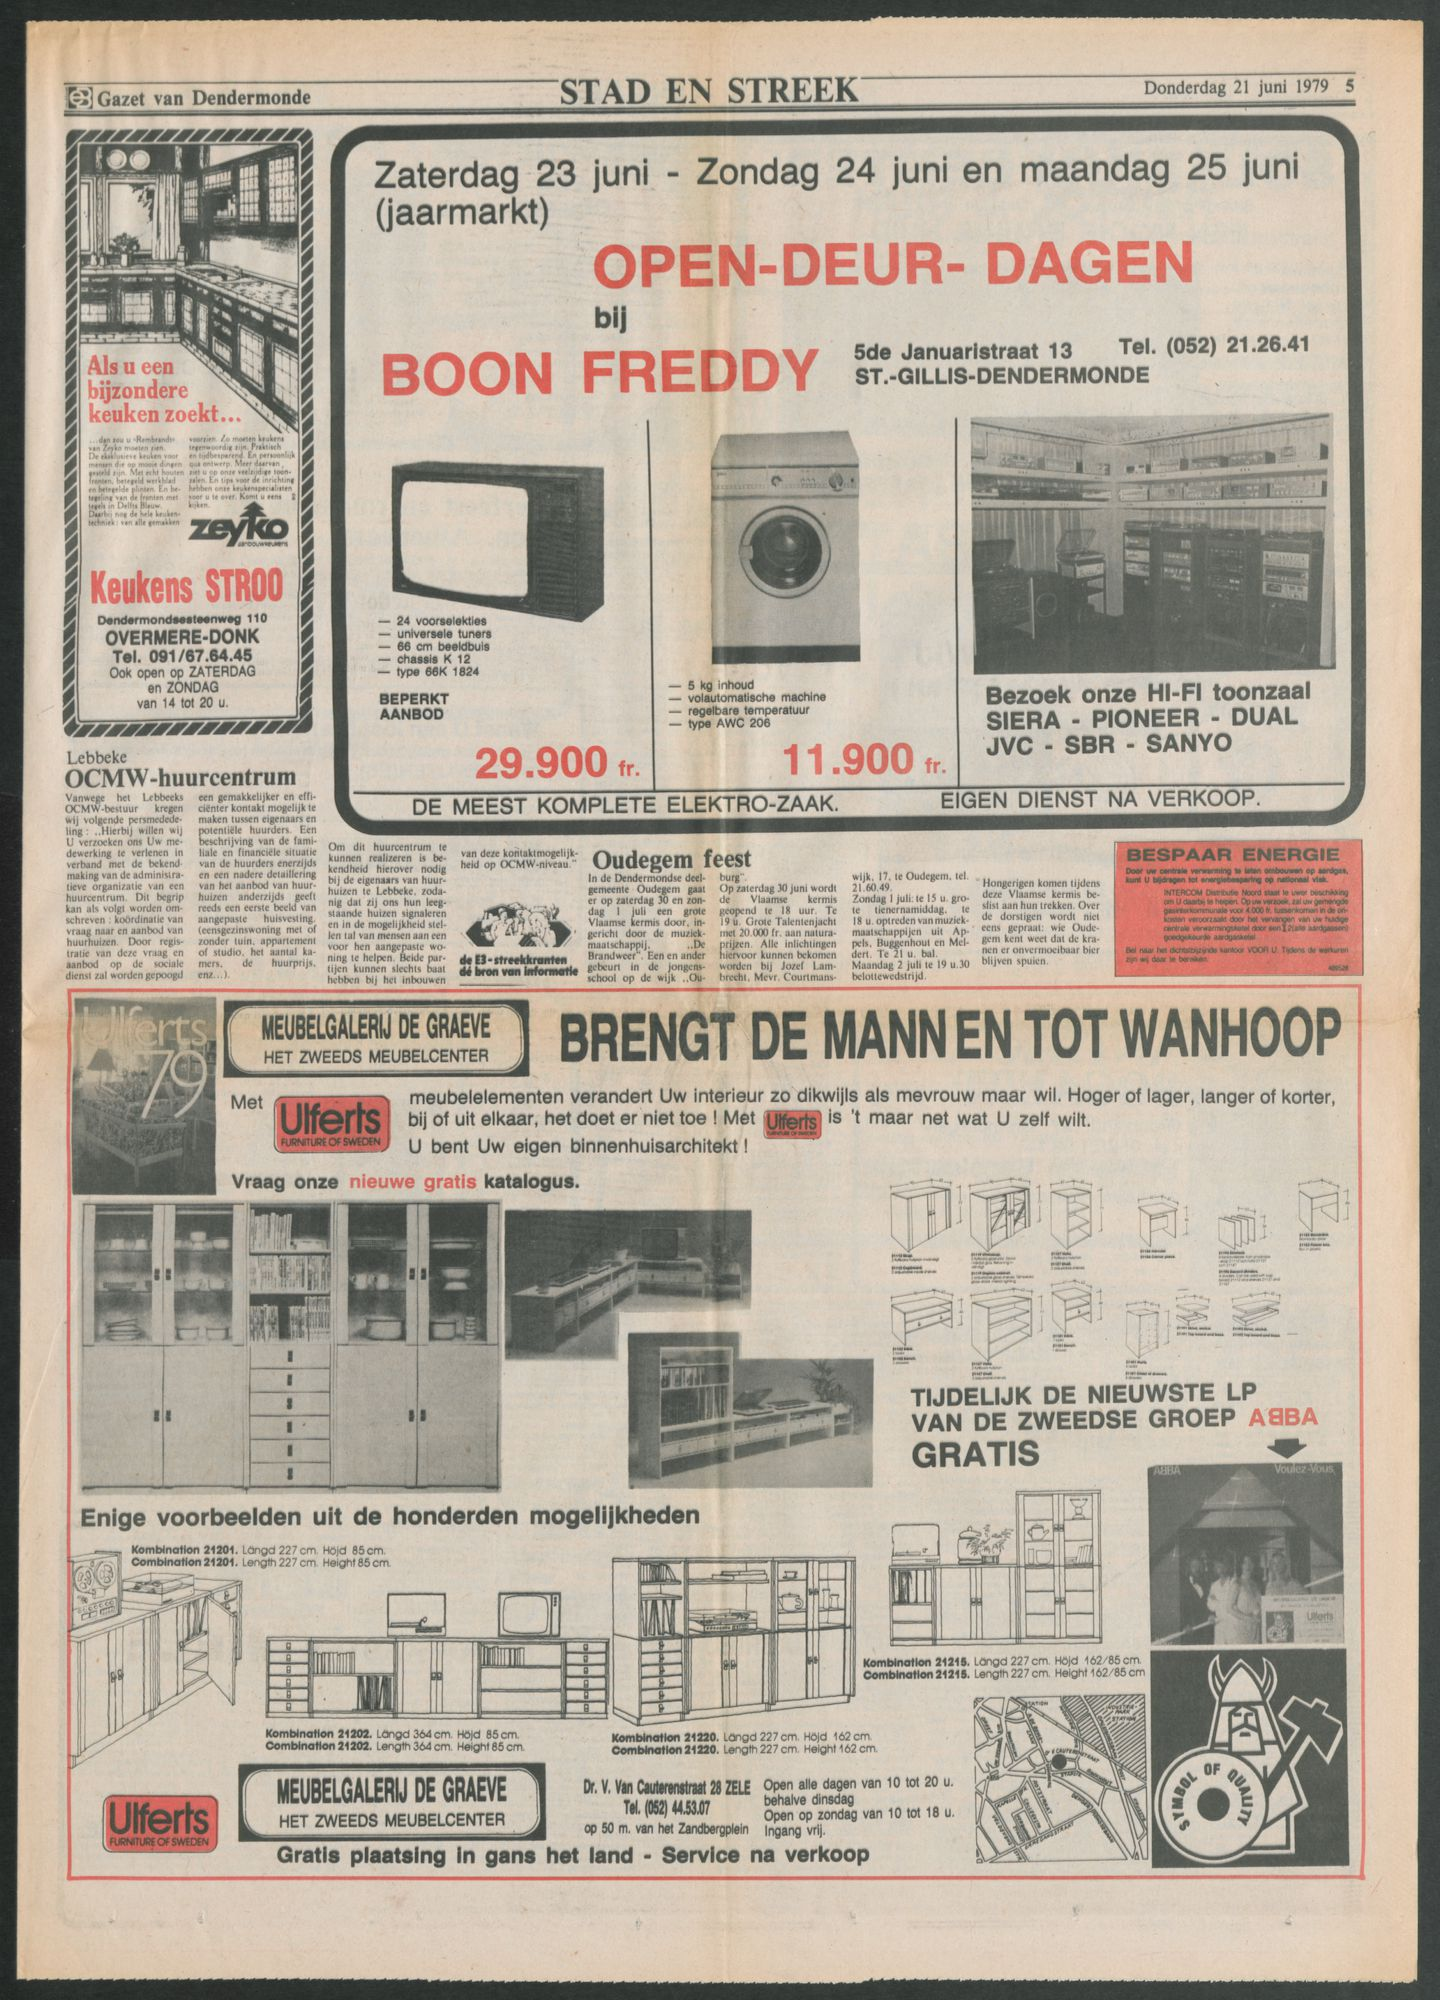 GAZET VAN DENDERMONDE 1979-06-21 p5